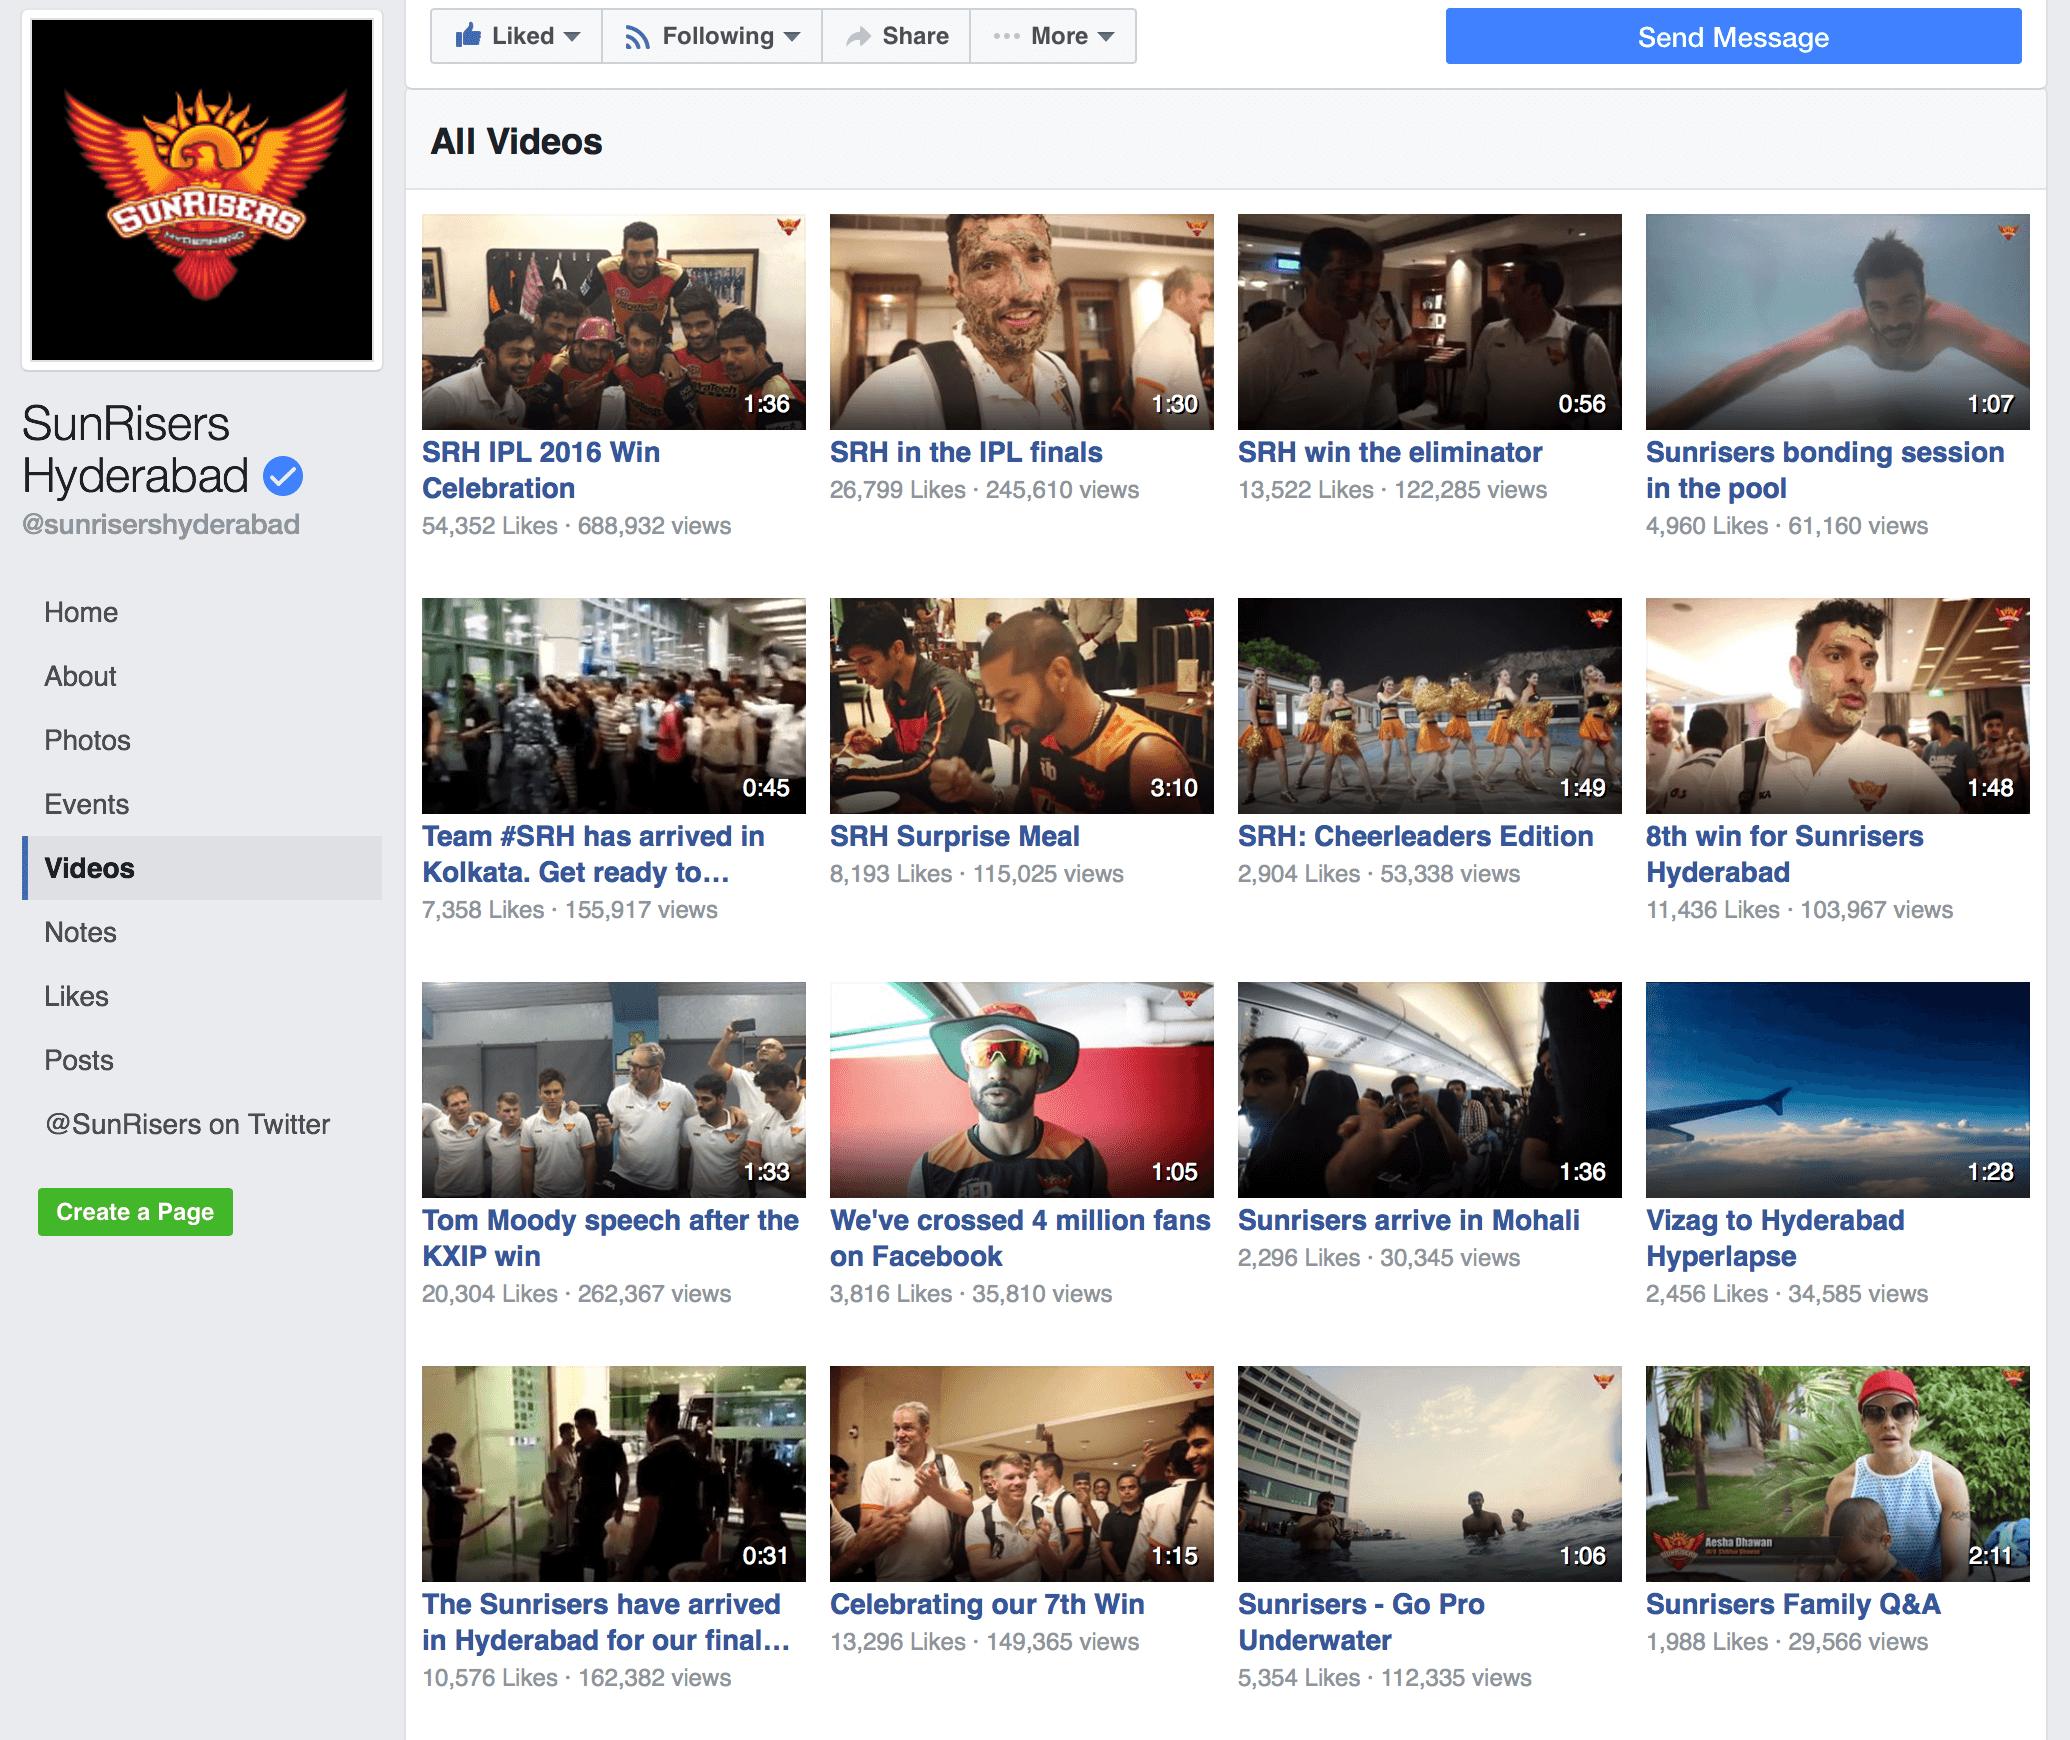 SRH videos